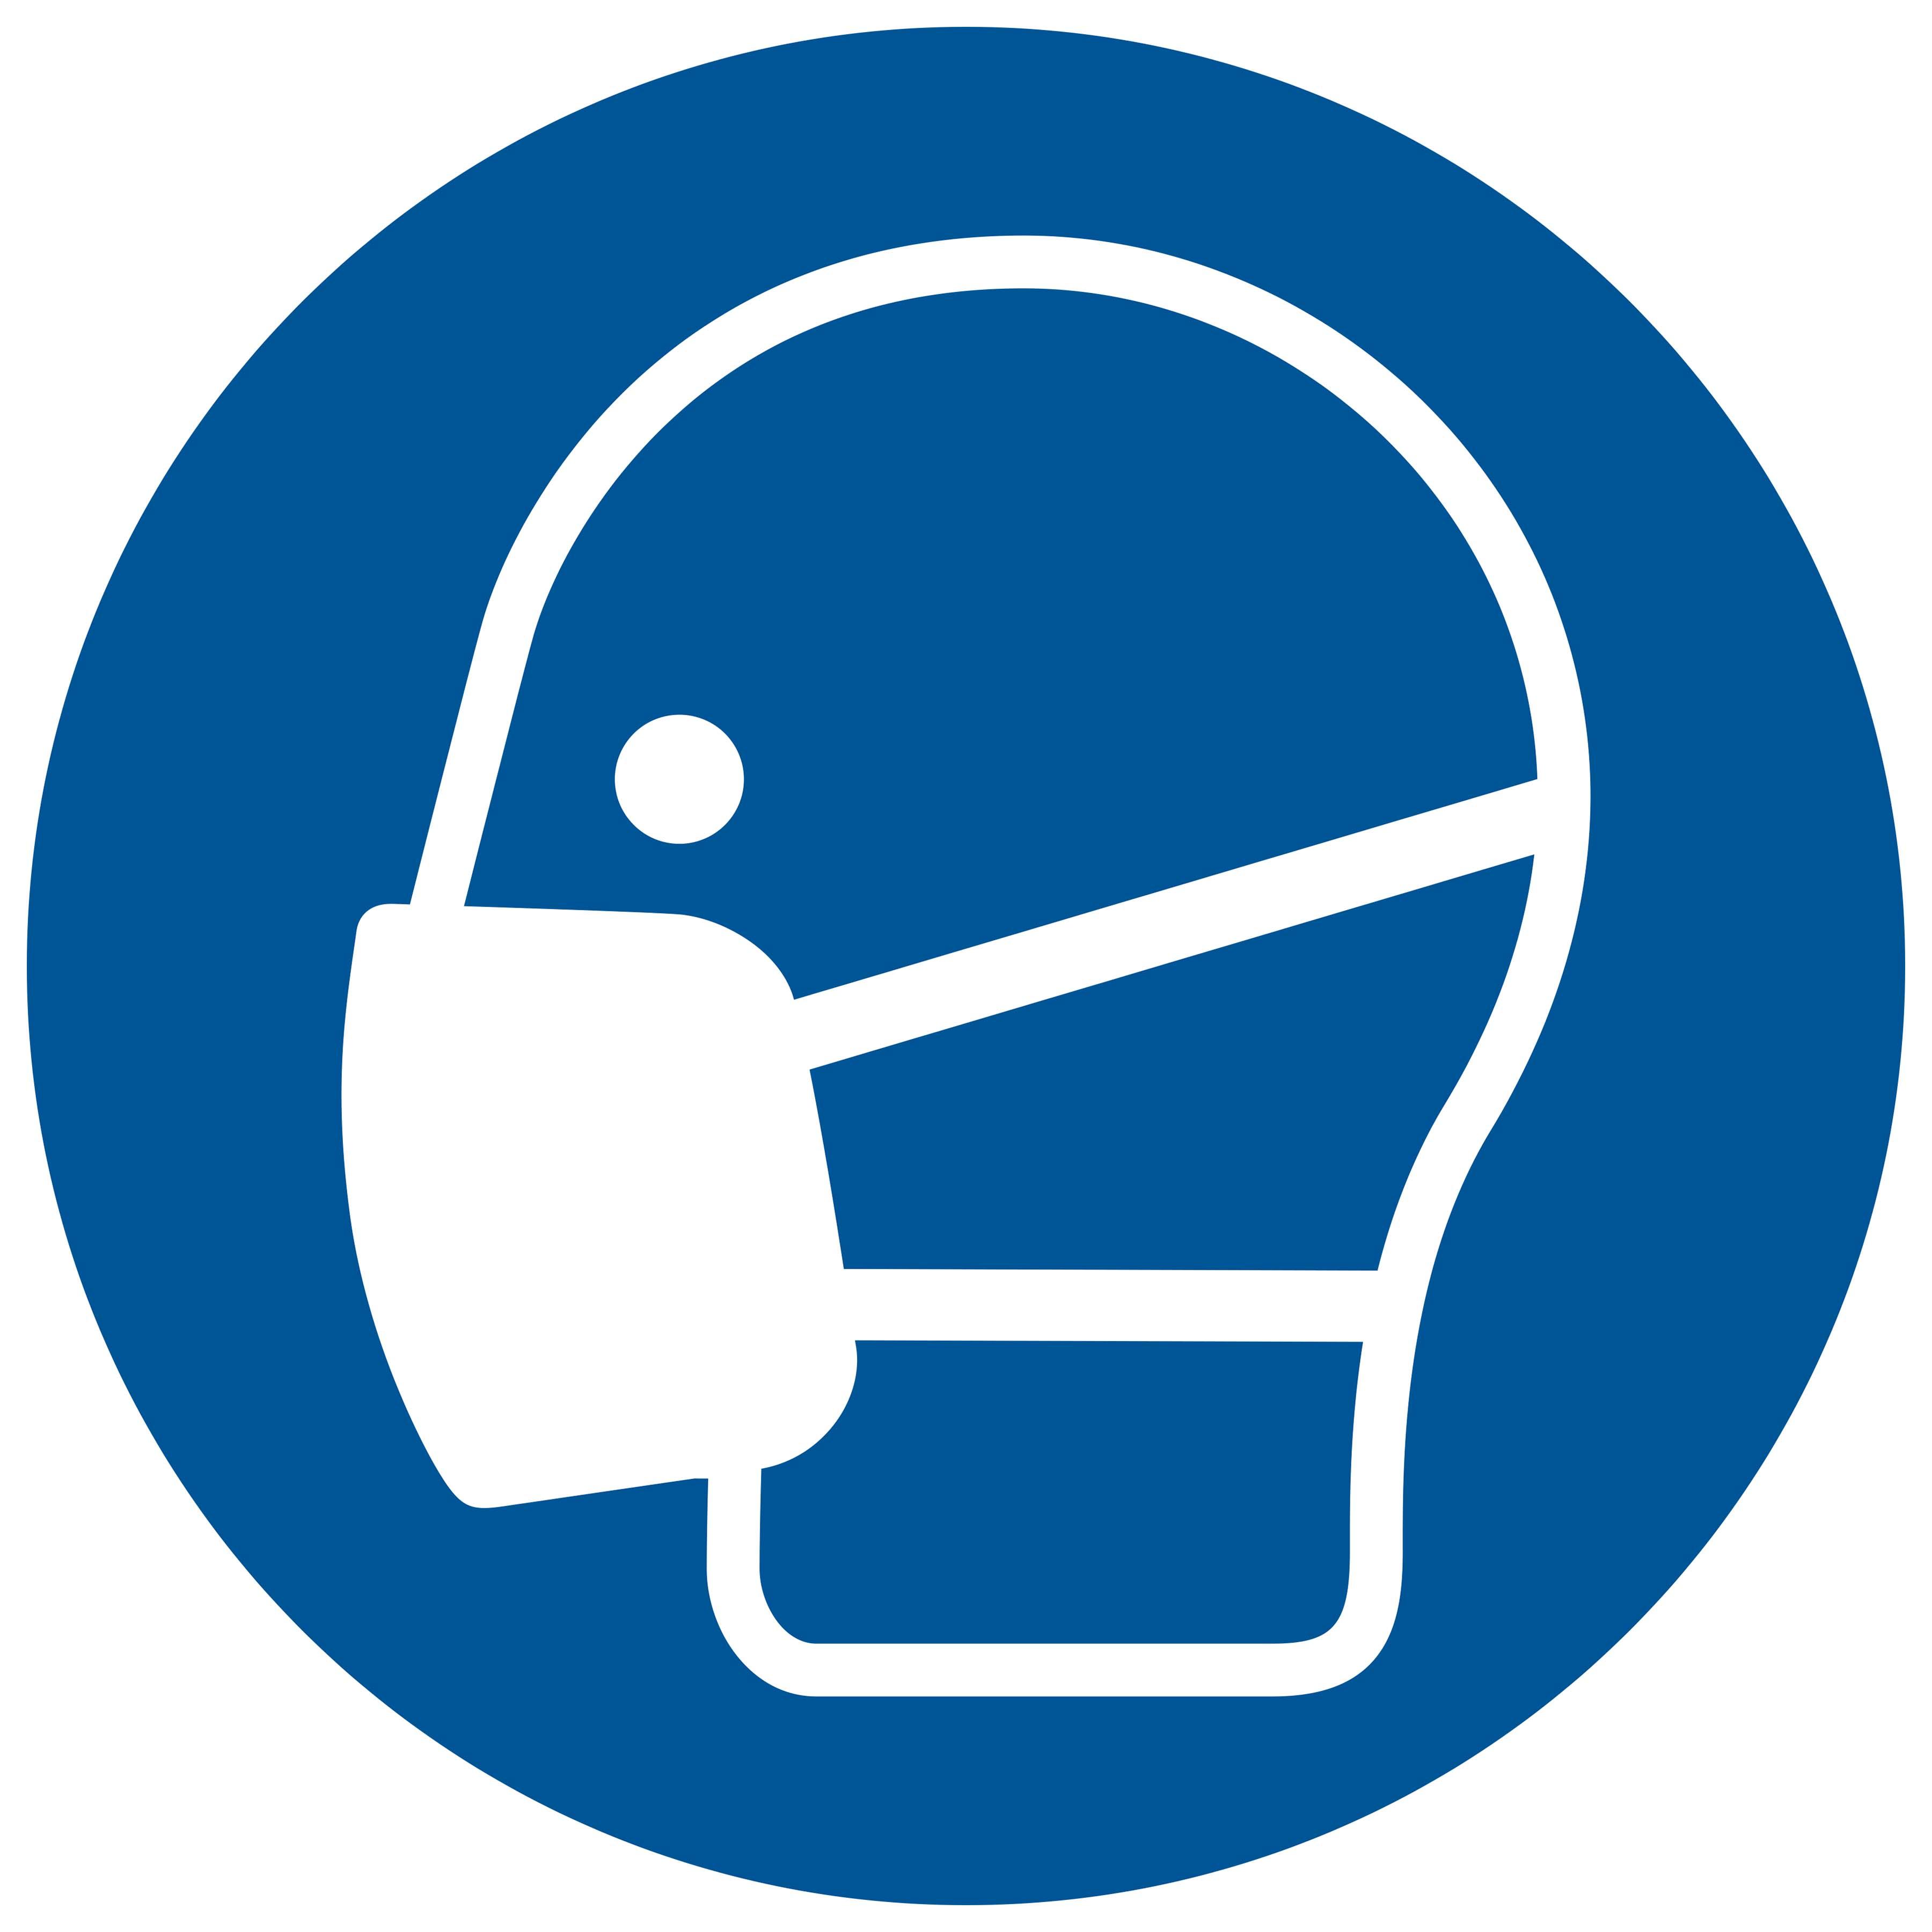 Sticker Mondkapje dragen verplicht - wearing a face mask is mandatory - le port d'un masque facial est obligatoire - Das Tragen einer Gesichtsmaske ist obligatorisch - social distance COVID19 COVID-19 corona virus